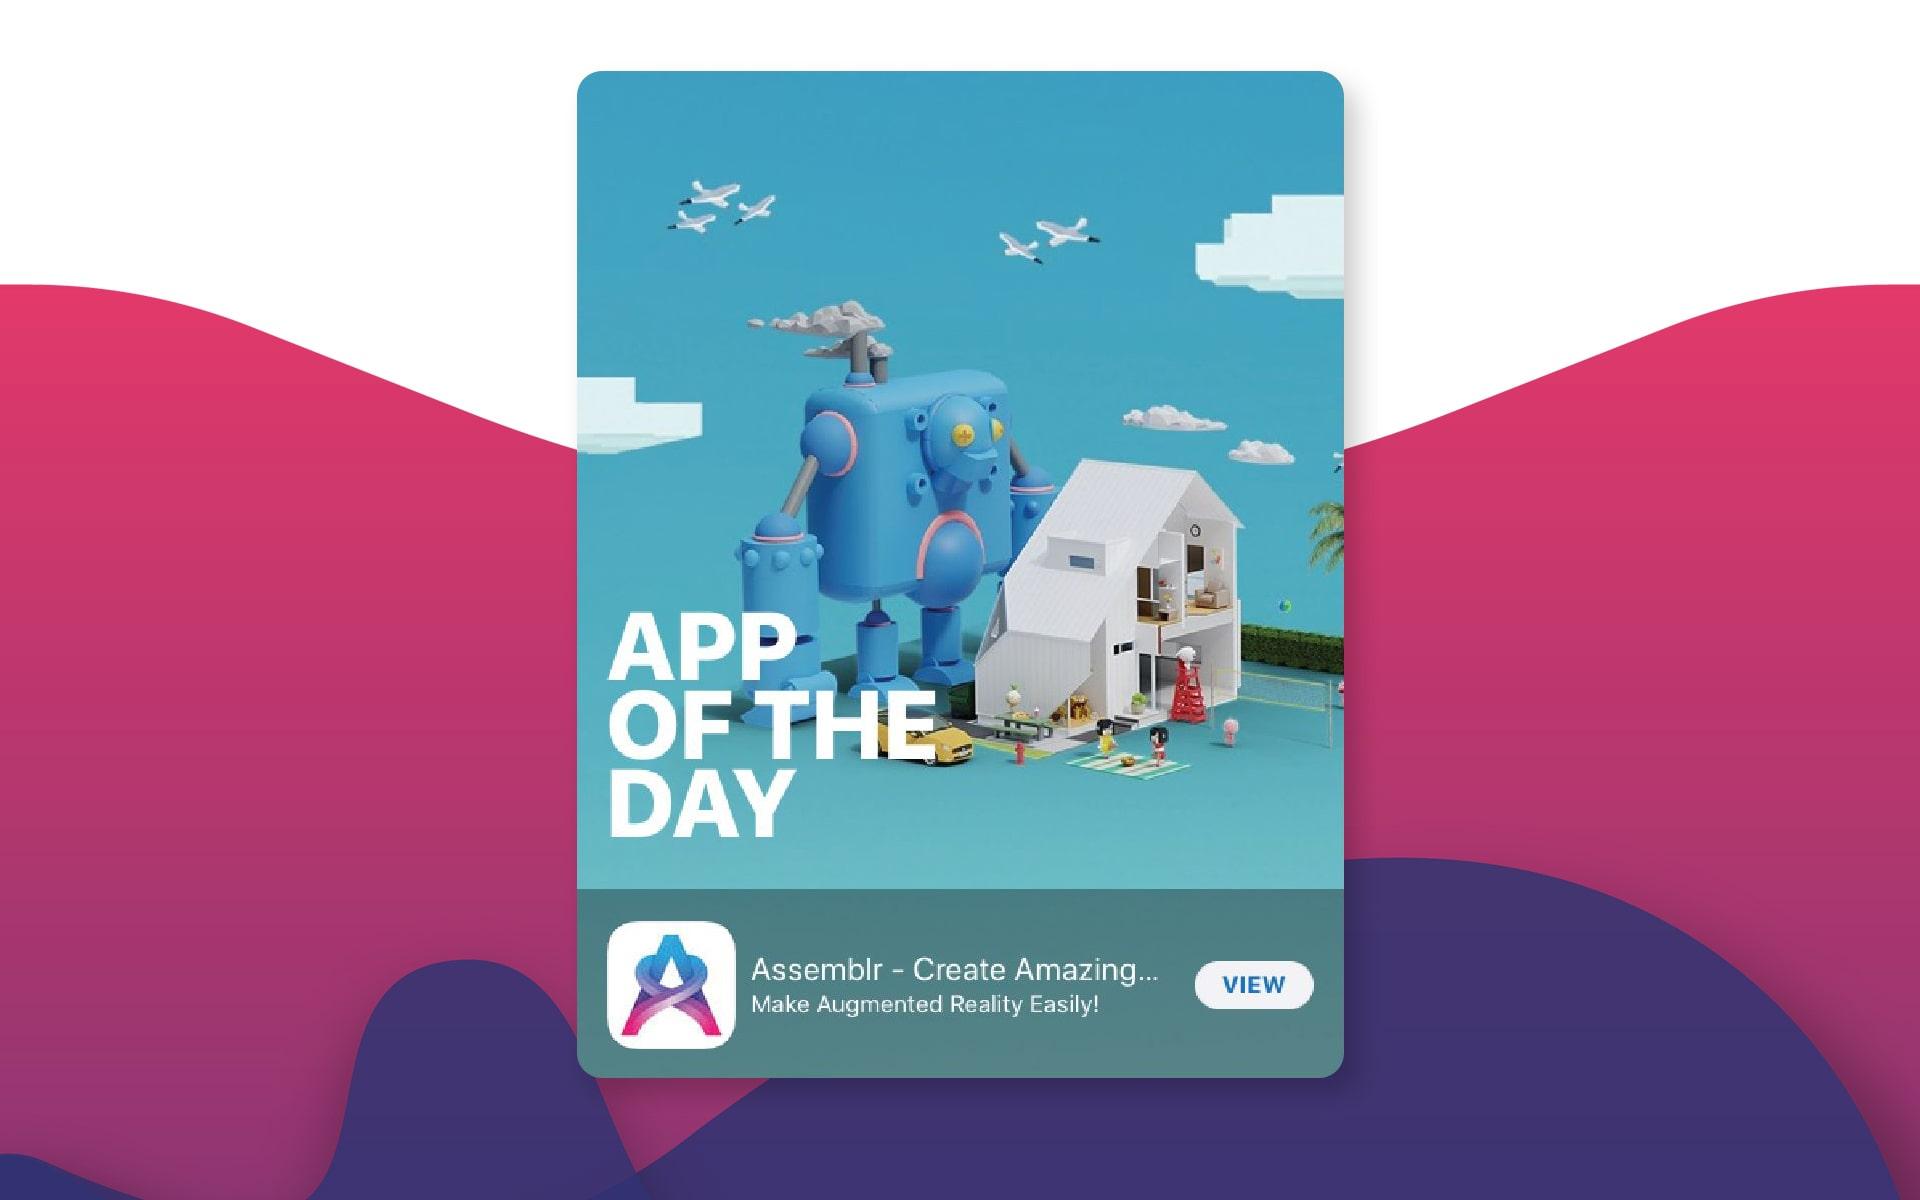 Apple Appstore - Assemblr Augmented reality Platform